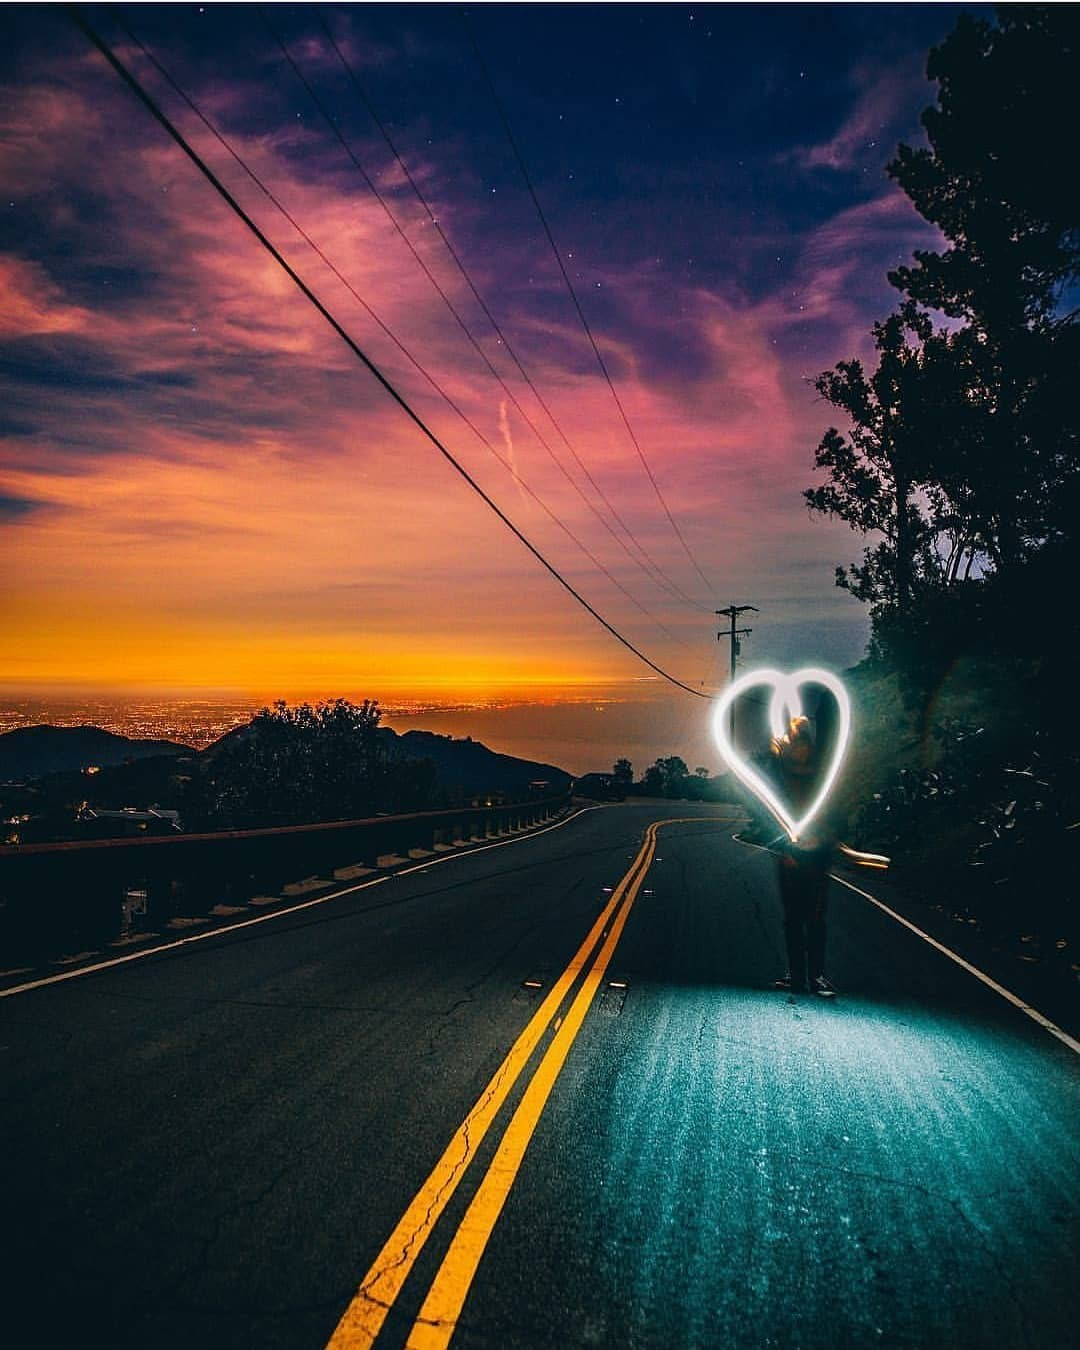 imagen romantica